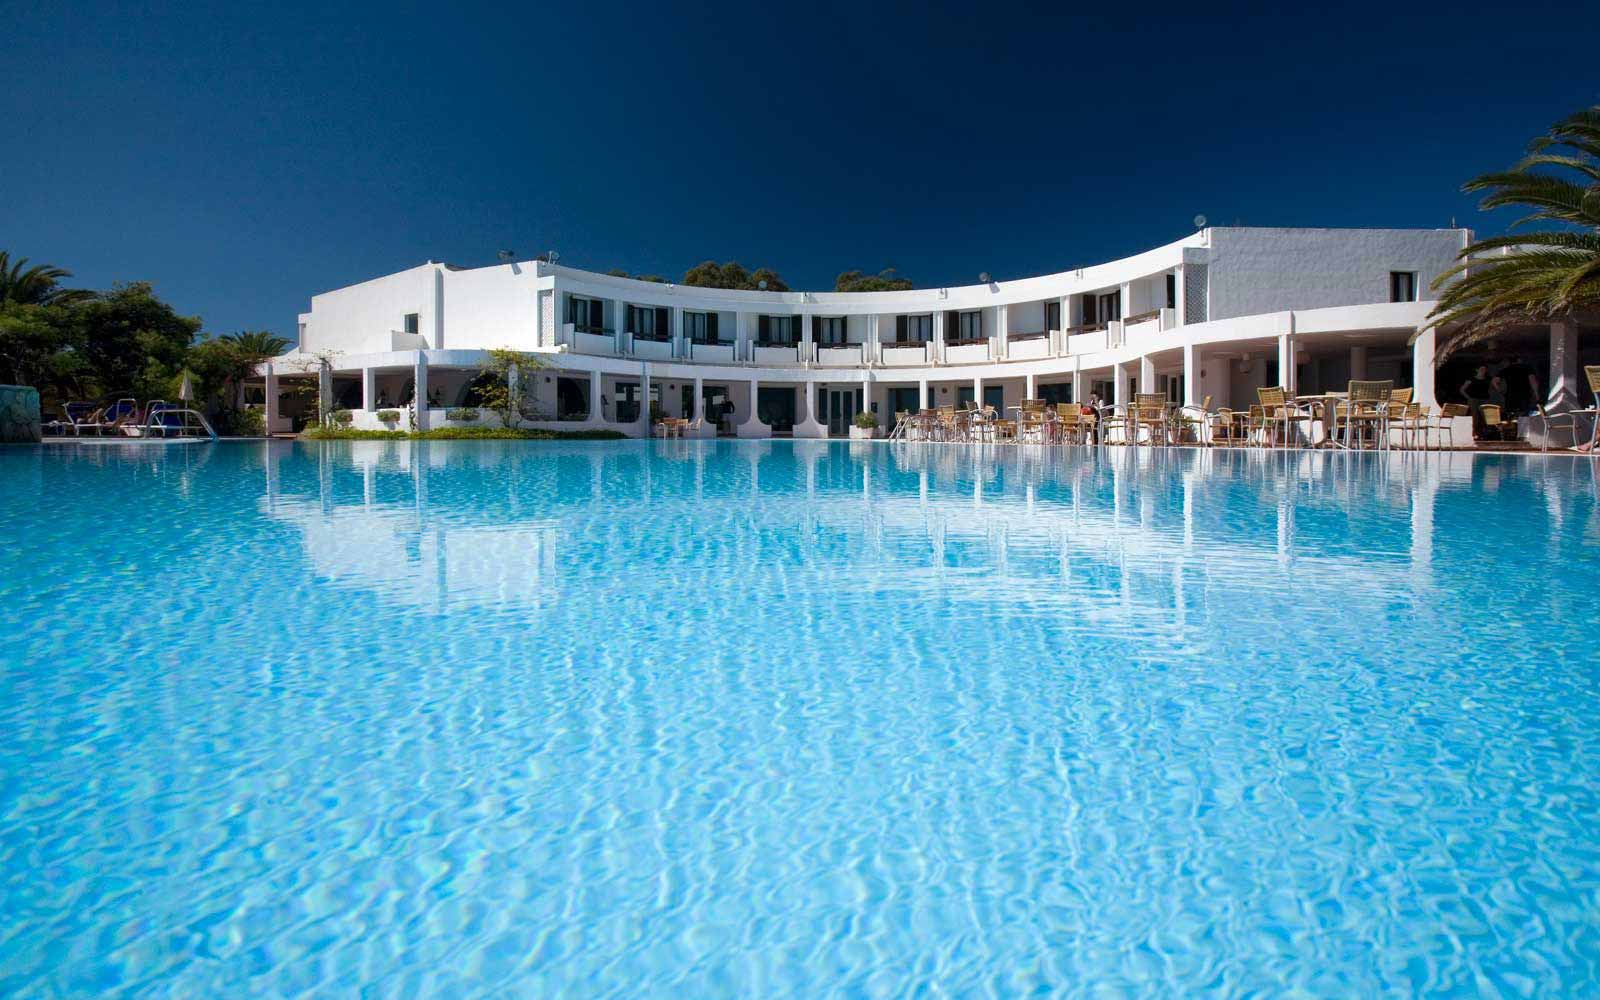 Swimming pool at Hotel Flamingo